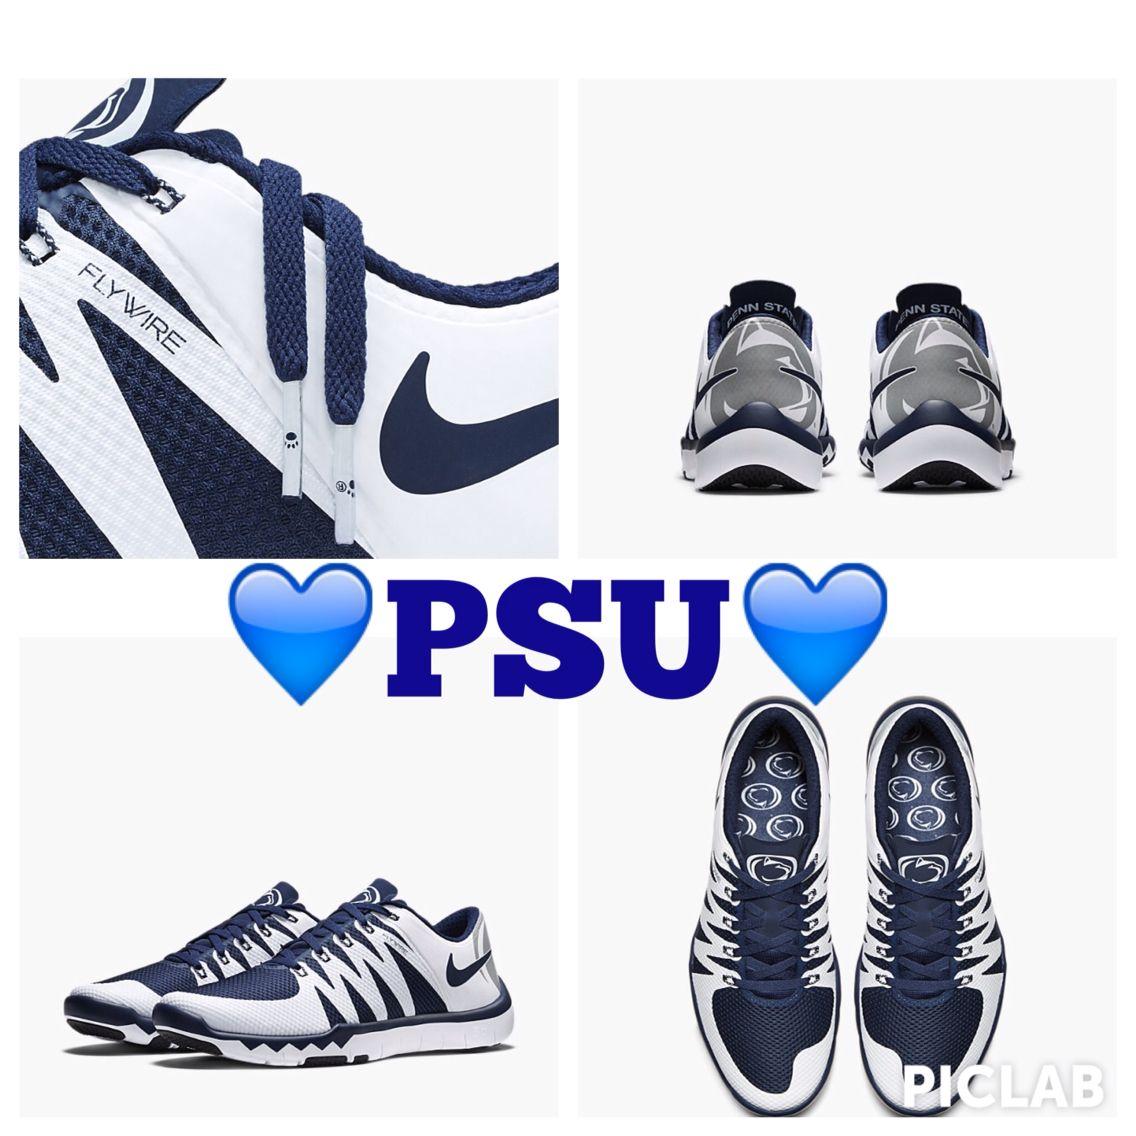 Psu Nike Nike Free Trainer Penn State Penn State University